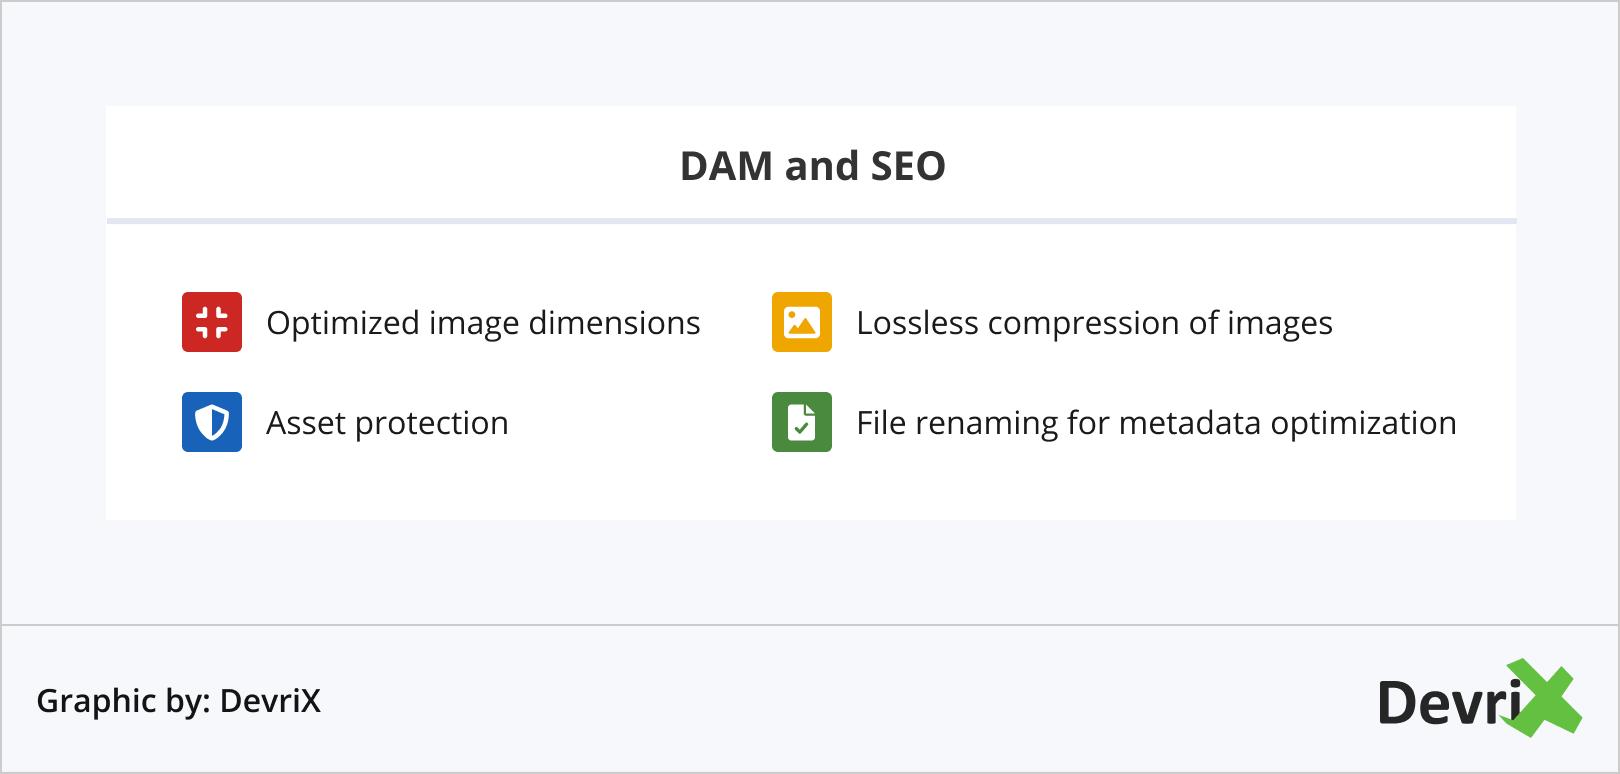 DAM and SEO